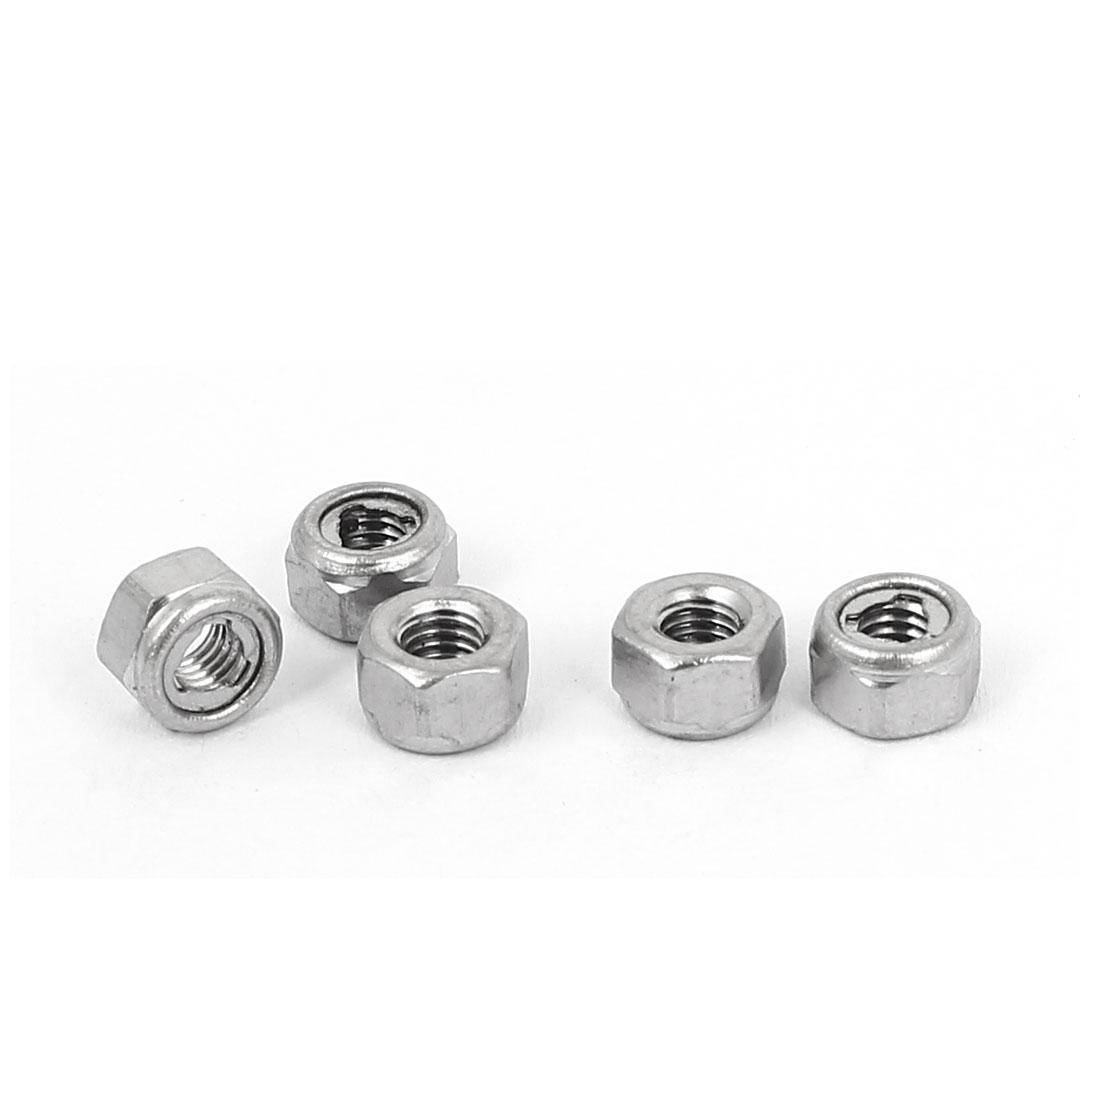 M3 304 Stainless Steel Self-Locking Anti-loose Insert Hex Lock Nut 5pcs